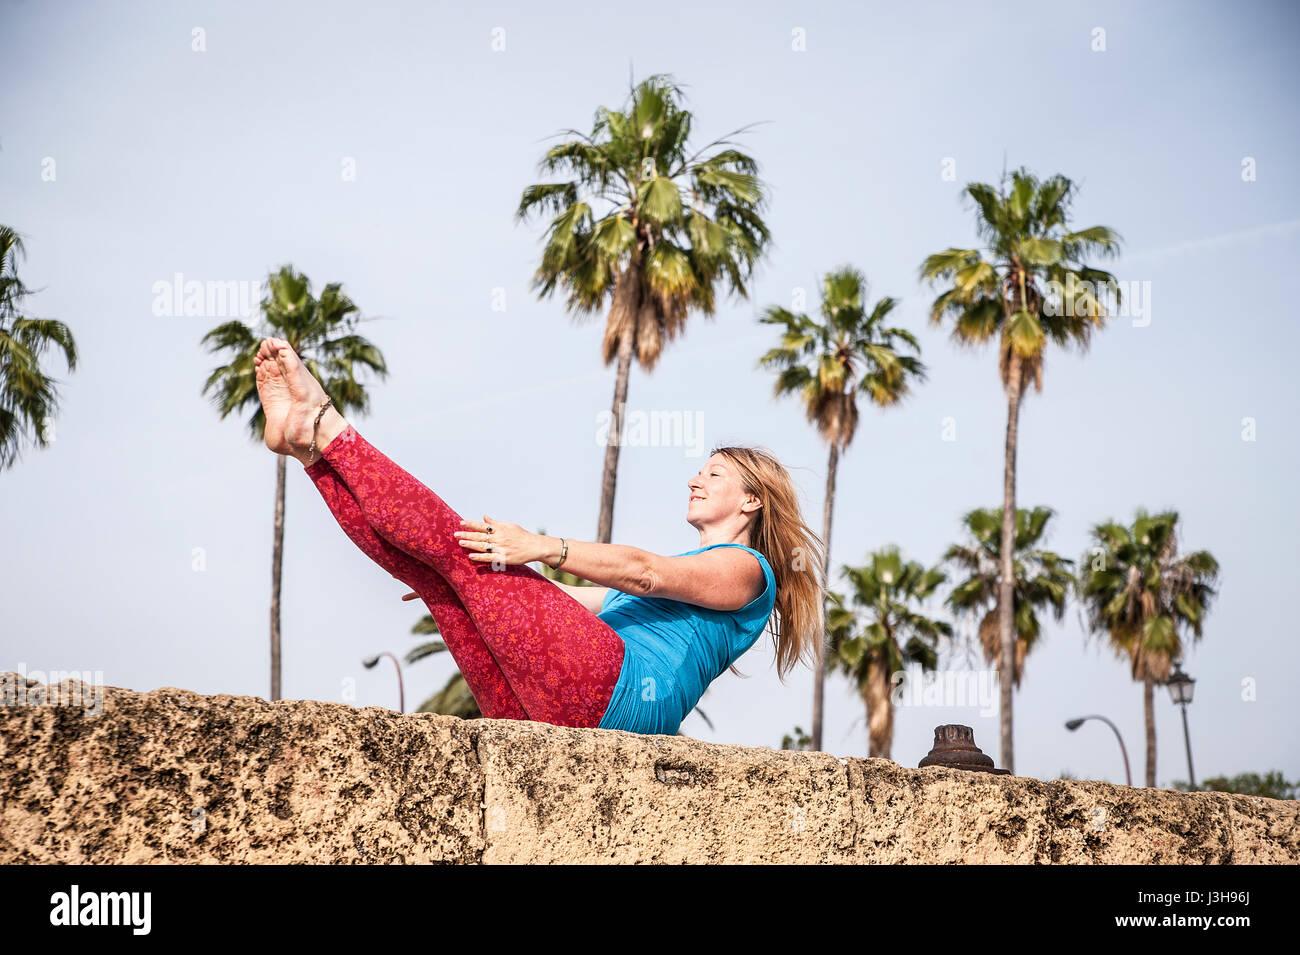 Spanien, Sevilla: Claudia ist eine professionelle Yoga-Lehrerin. Stockfoto